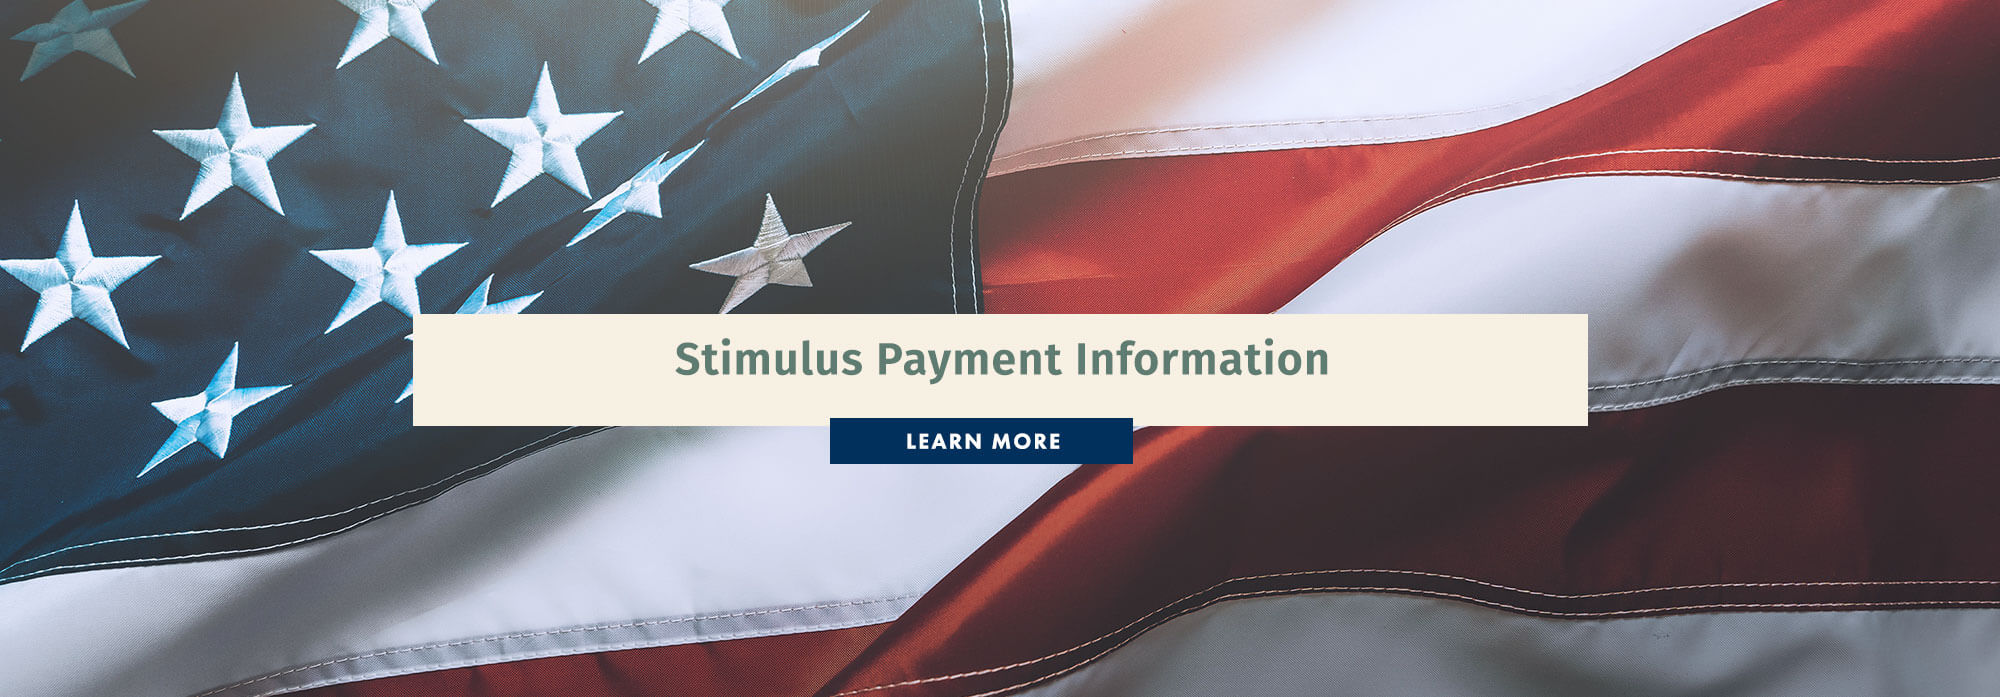 Stimulus Payment Information